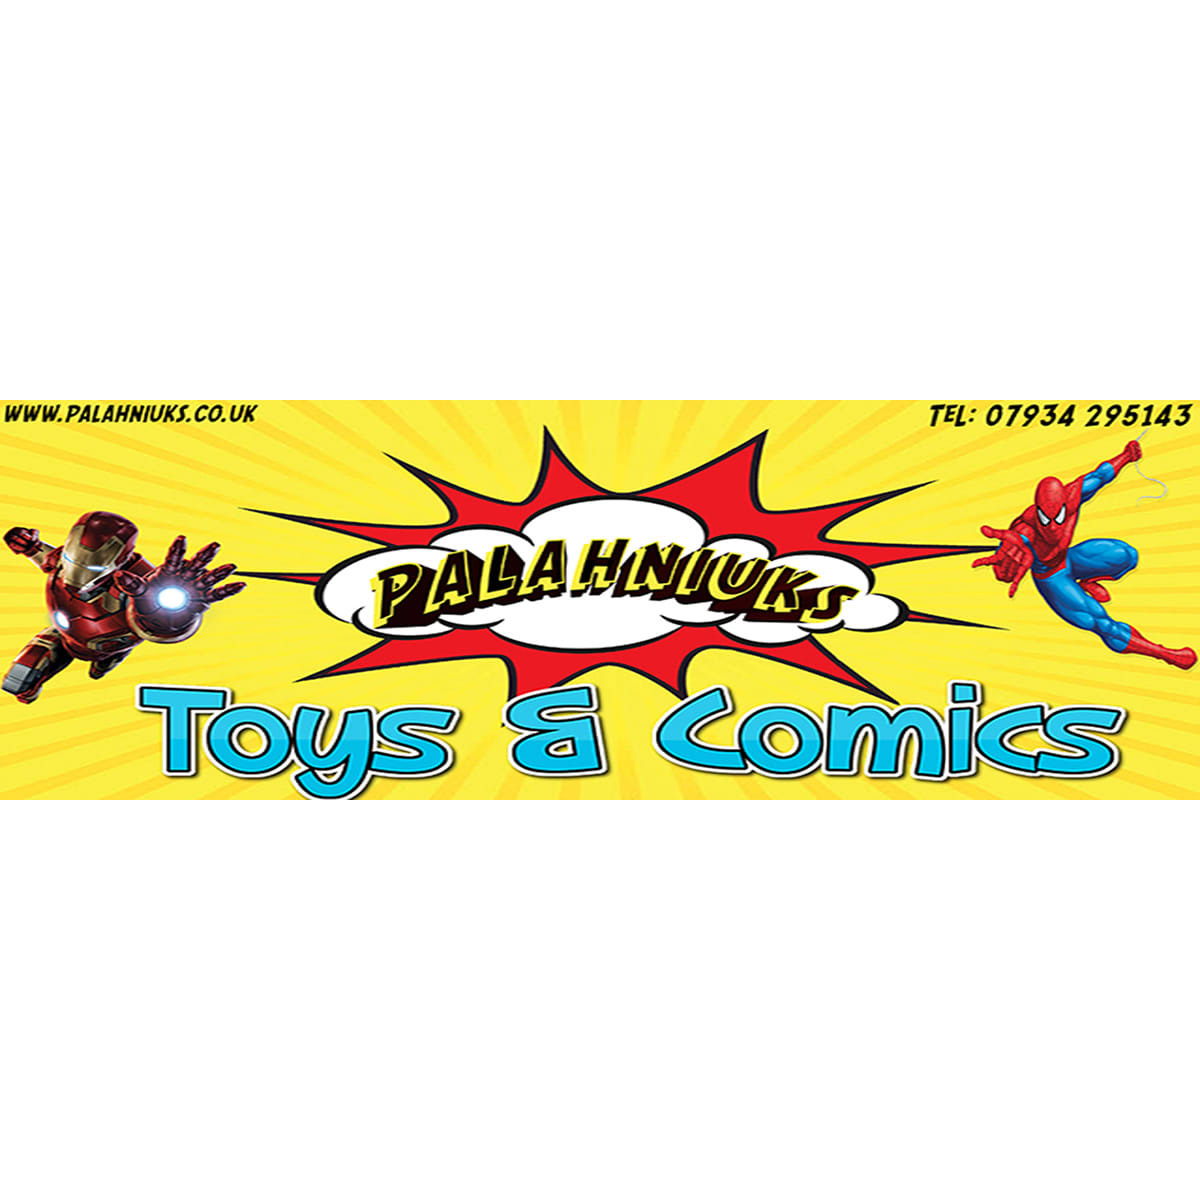 Palahniuks Toys & Comics - Swindon, Wiltshire SN4 9QT - 01793 853405 | ShowMeLocal.com